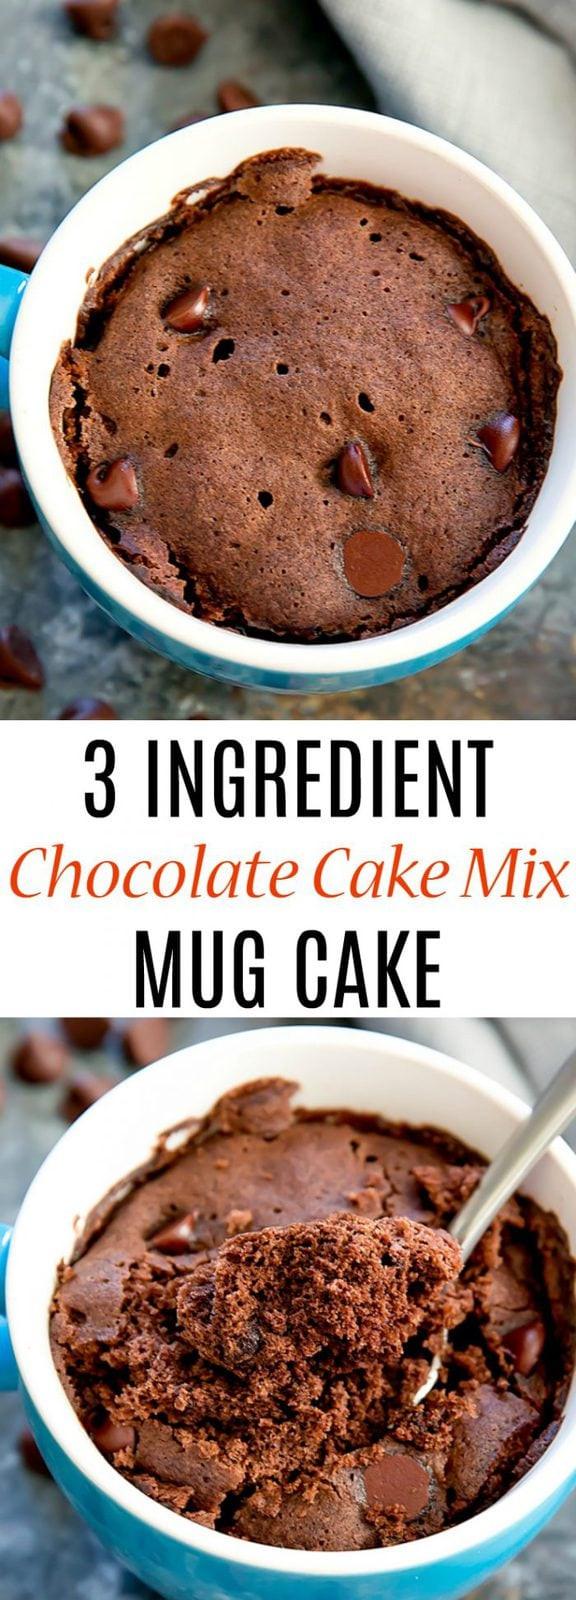 Mug Cake With Cake Mix  3 Ingre nt Chocolate Cake Mix Mug Cake Kirbie s Cravings